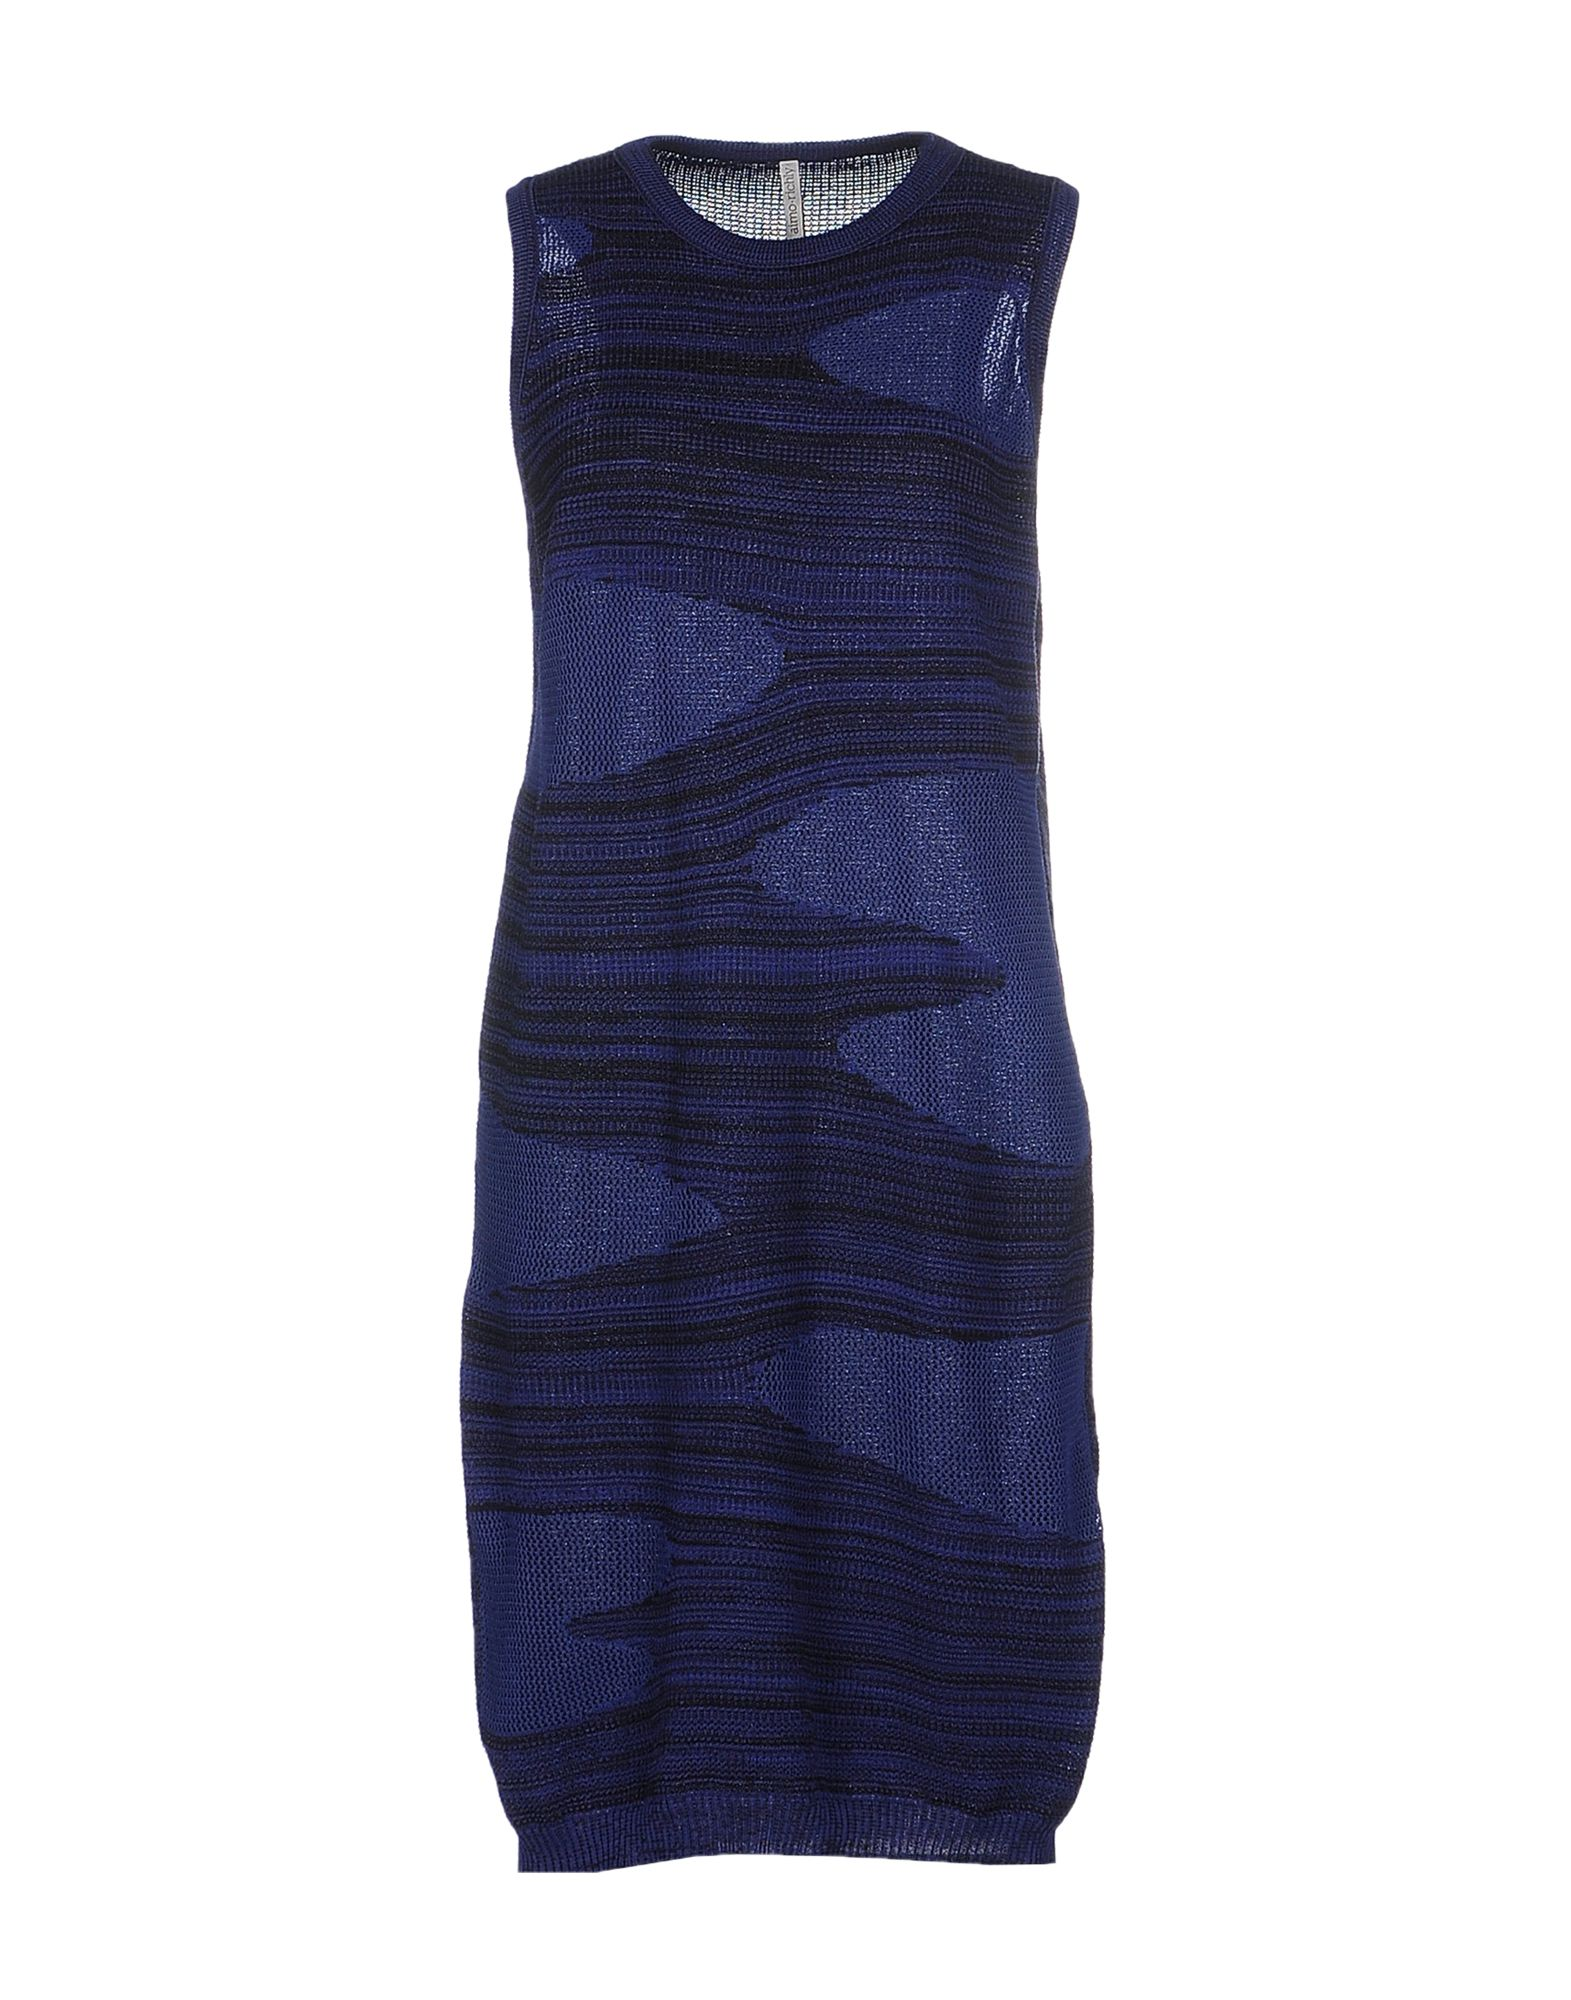 AIMO RICHLY Short Dress in Dark Purple